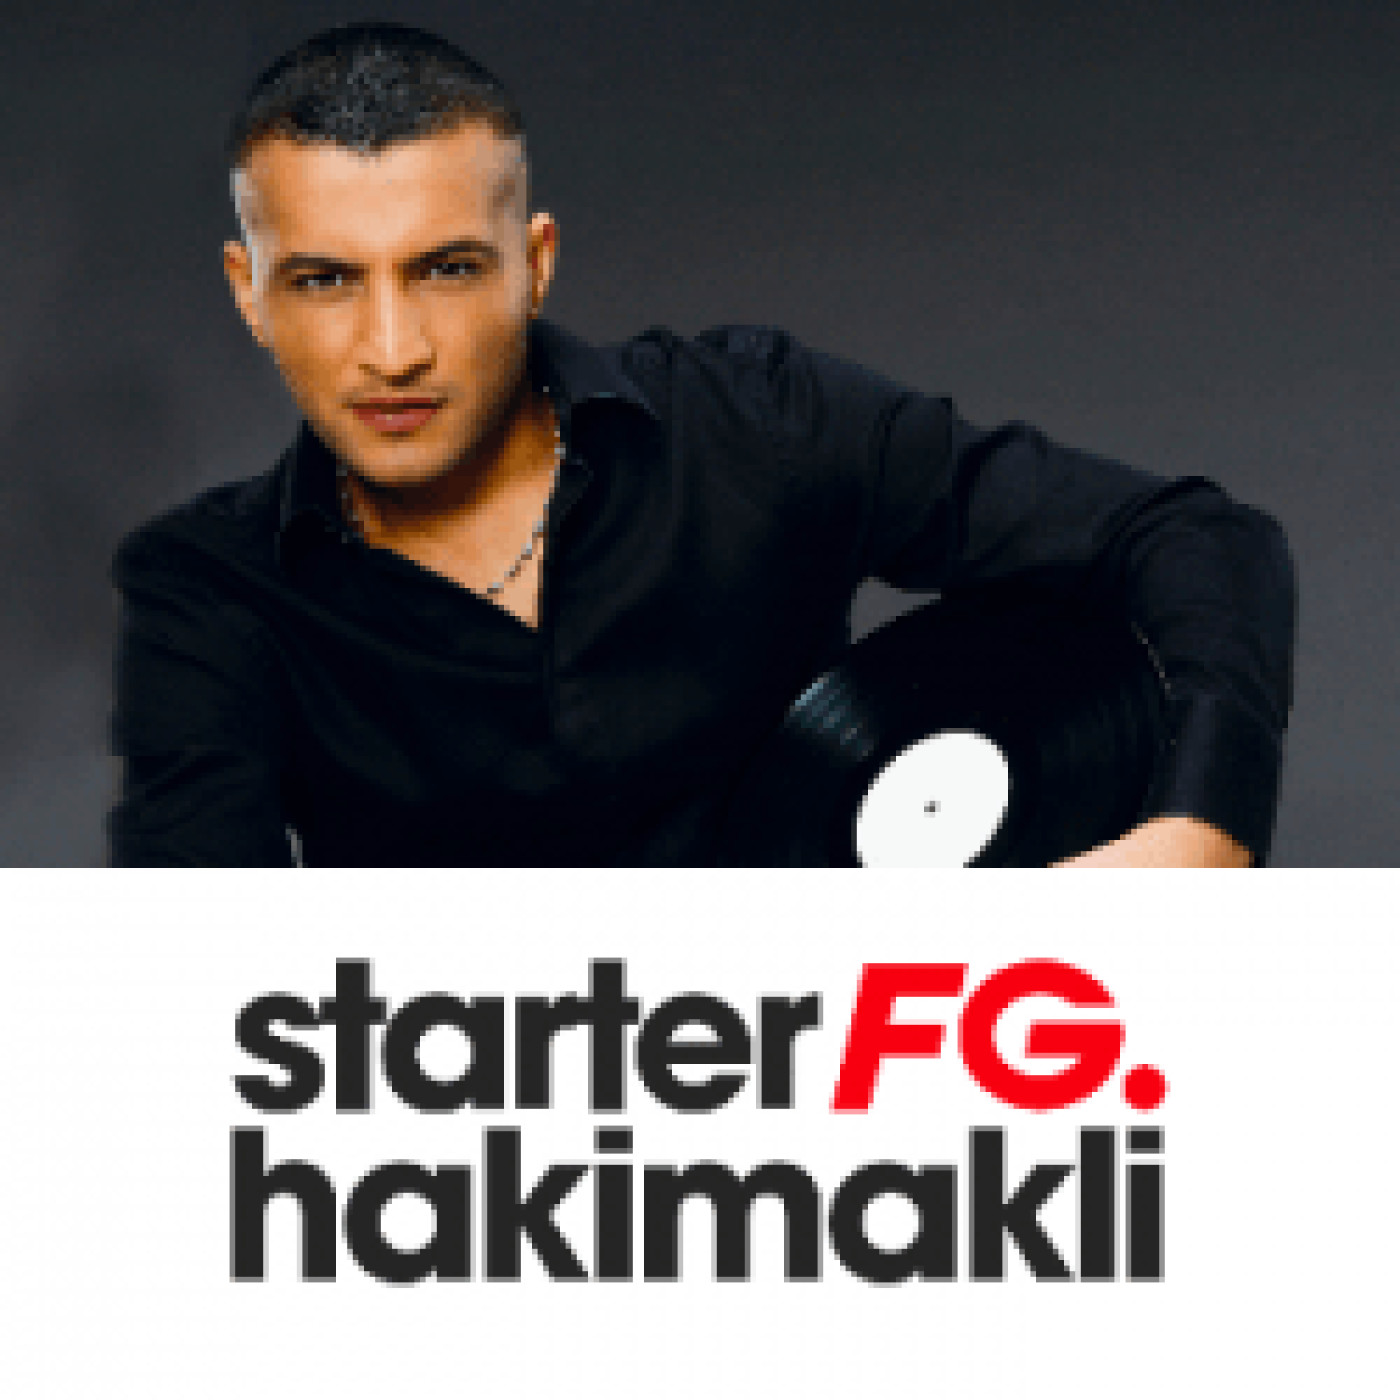 STARTER FG BY HAKIMAKLI LUNDI 11 JANVIER 2021